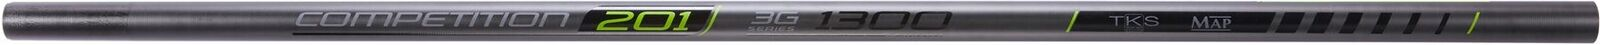 Map TKS 201 3G Series 13.0M Fishing Rod